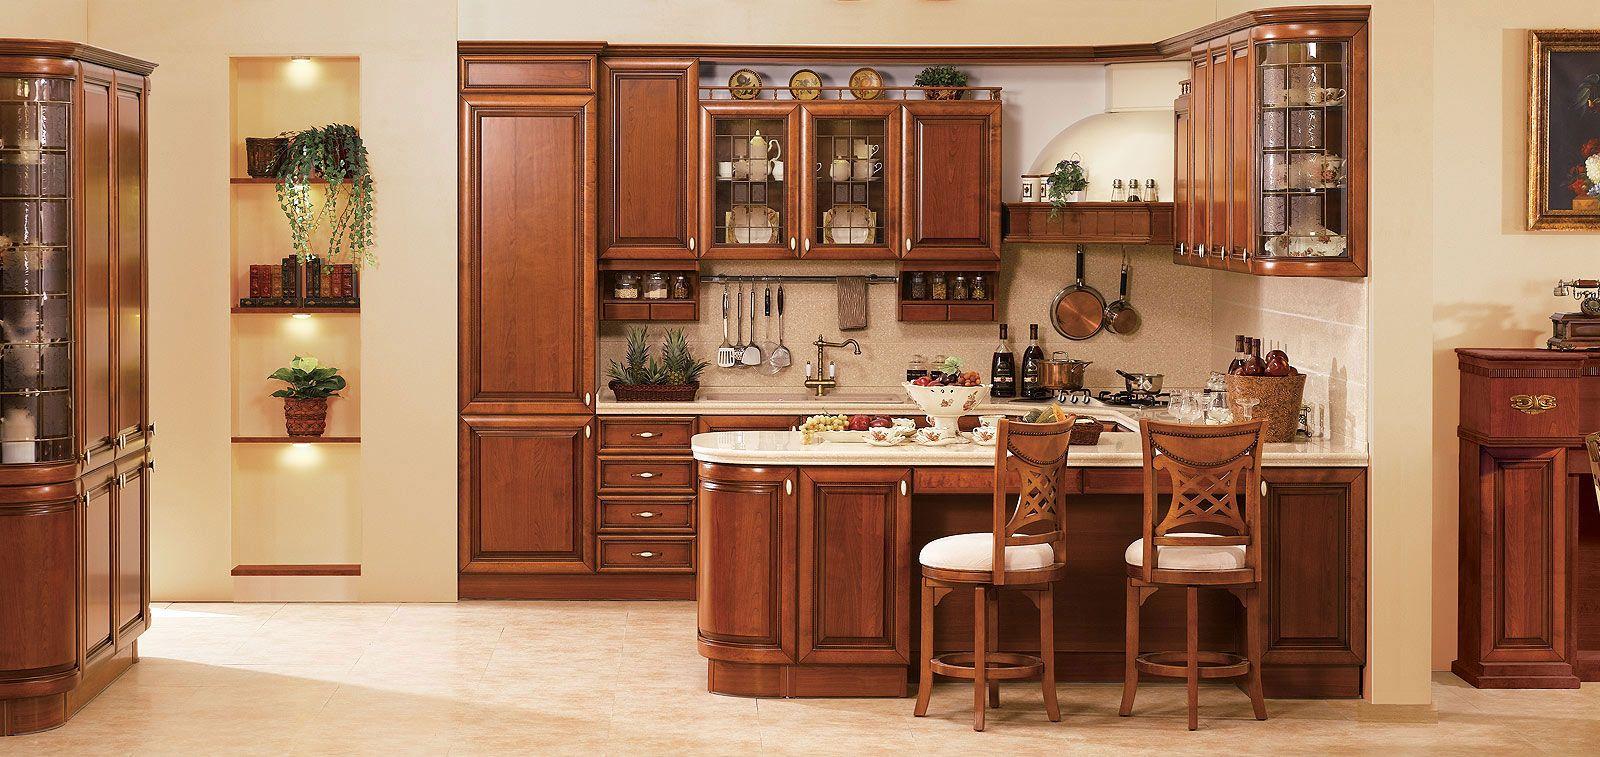 beige rustic themed modular kitchen design #lovely #kitchen